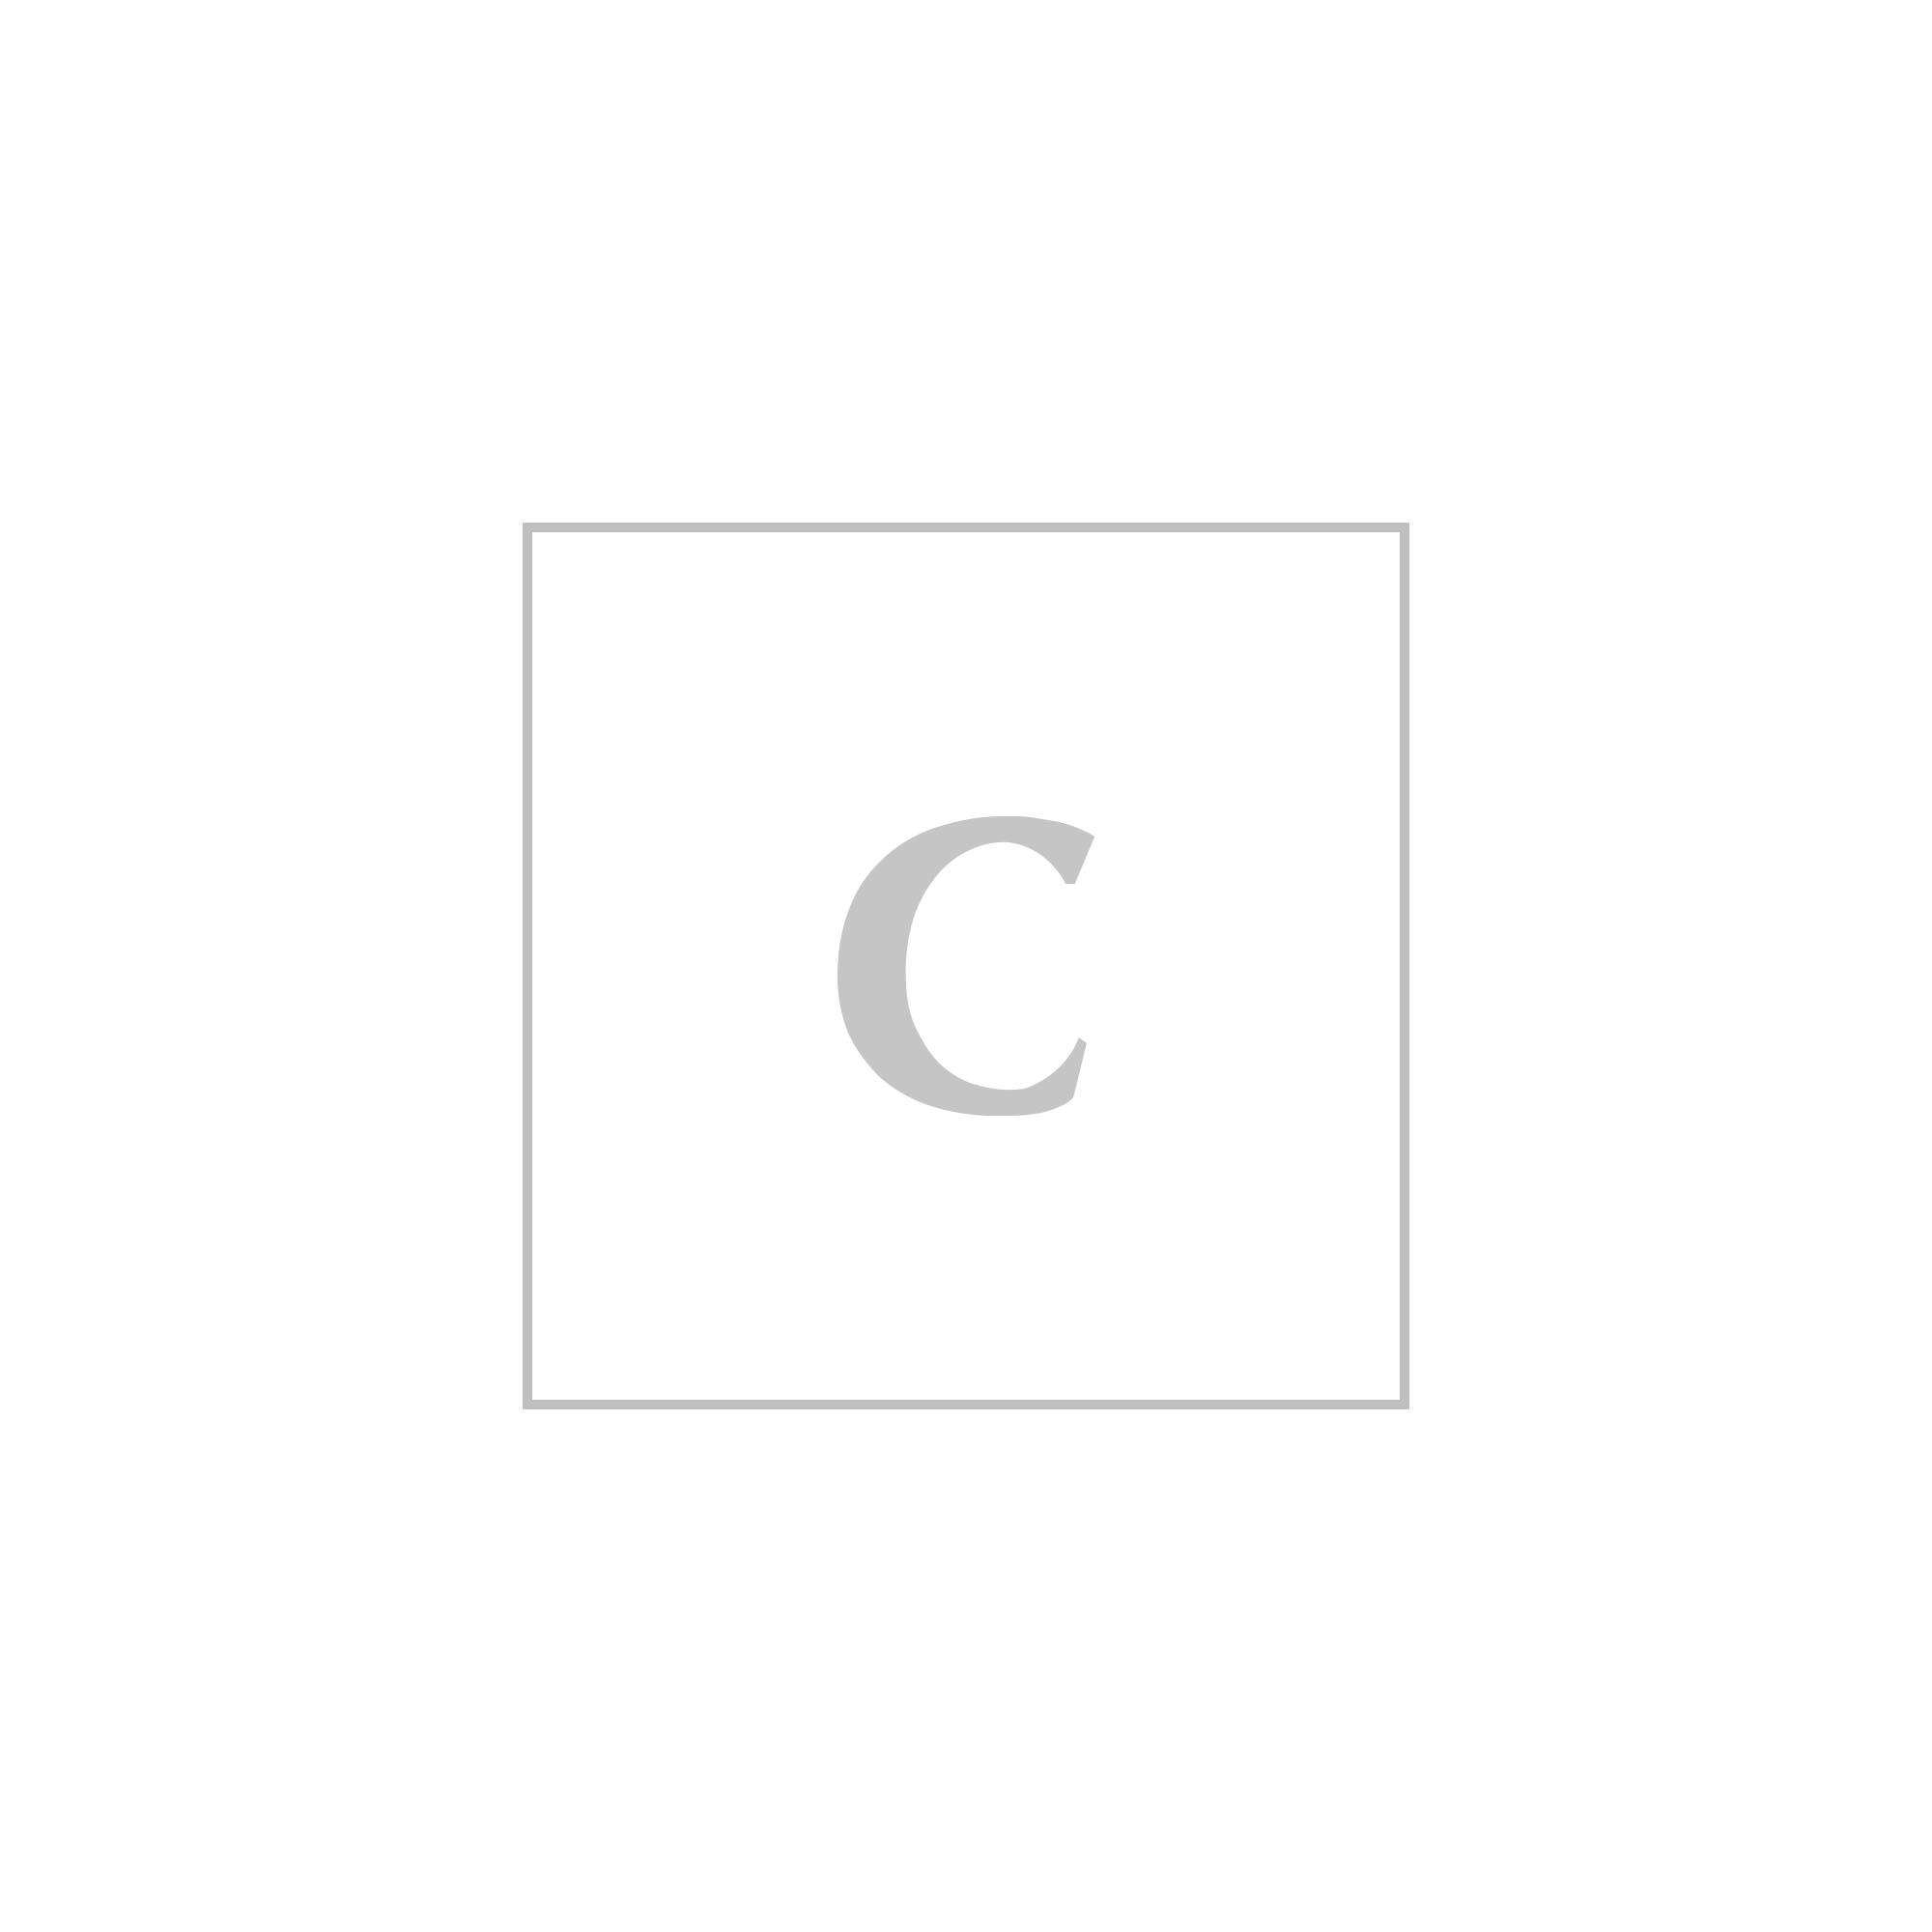 Dolce & gabbana portachiavi pelle stampa dauphine dg family